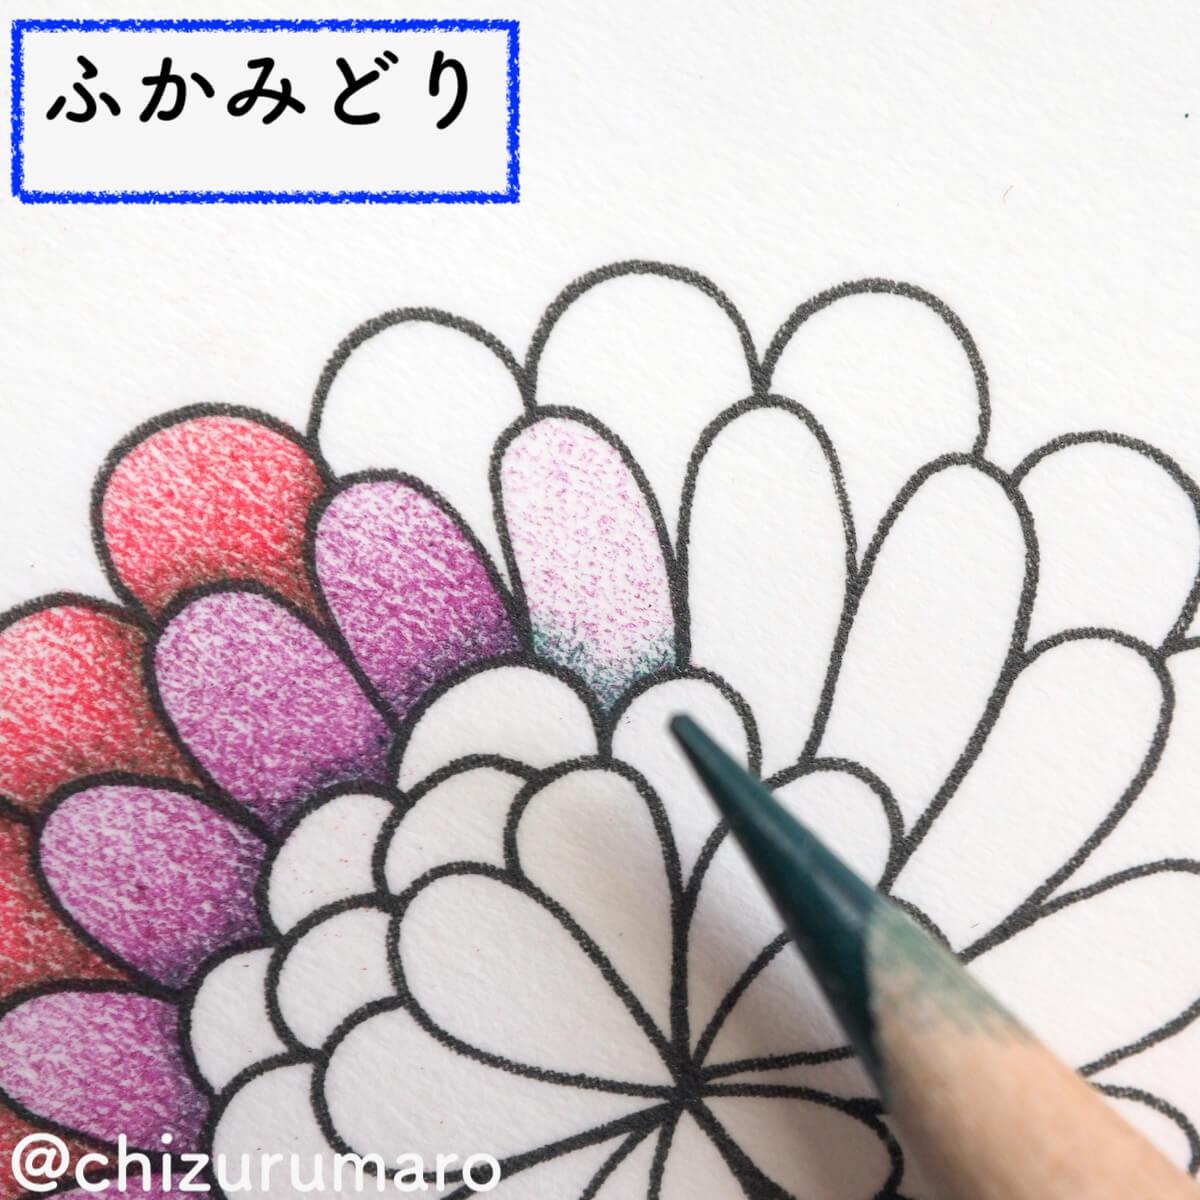 f:id:chizurumaro:20200326115054j:plain